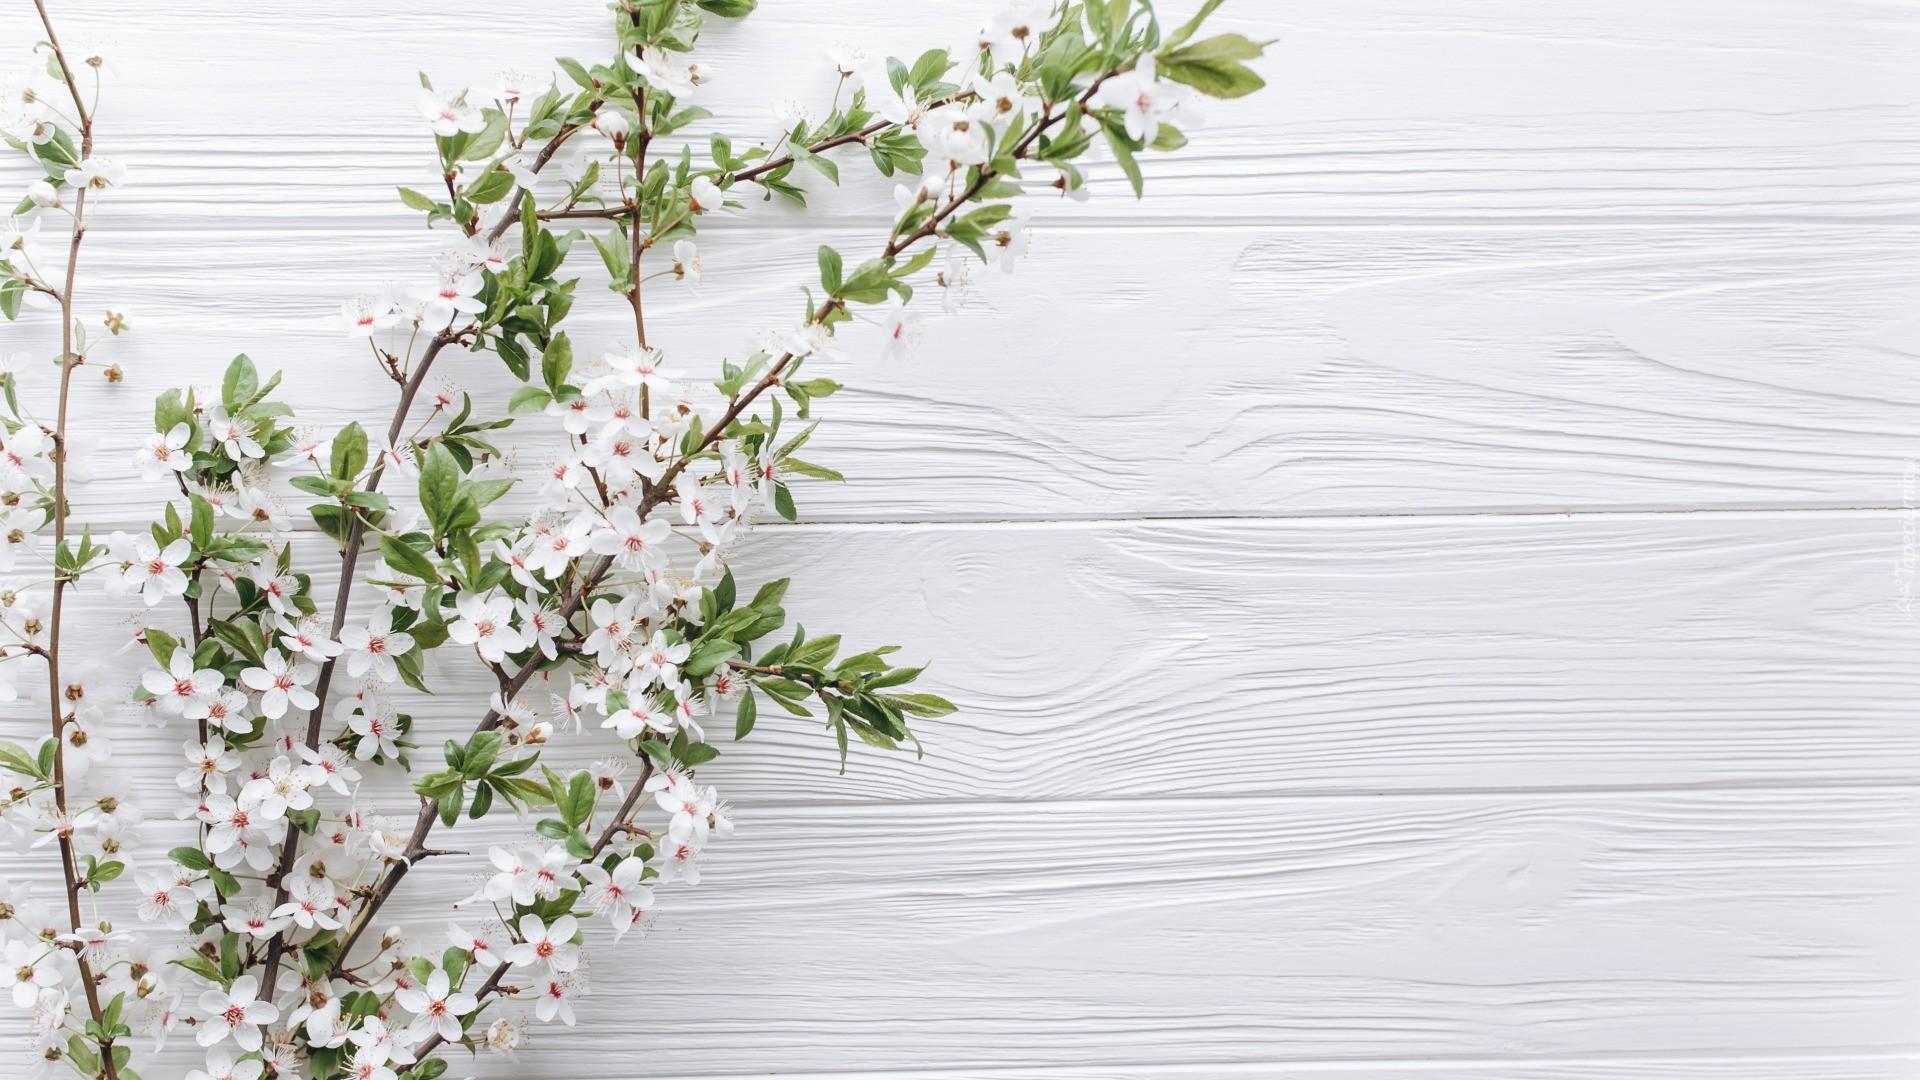 White Wood Free Wallpaper